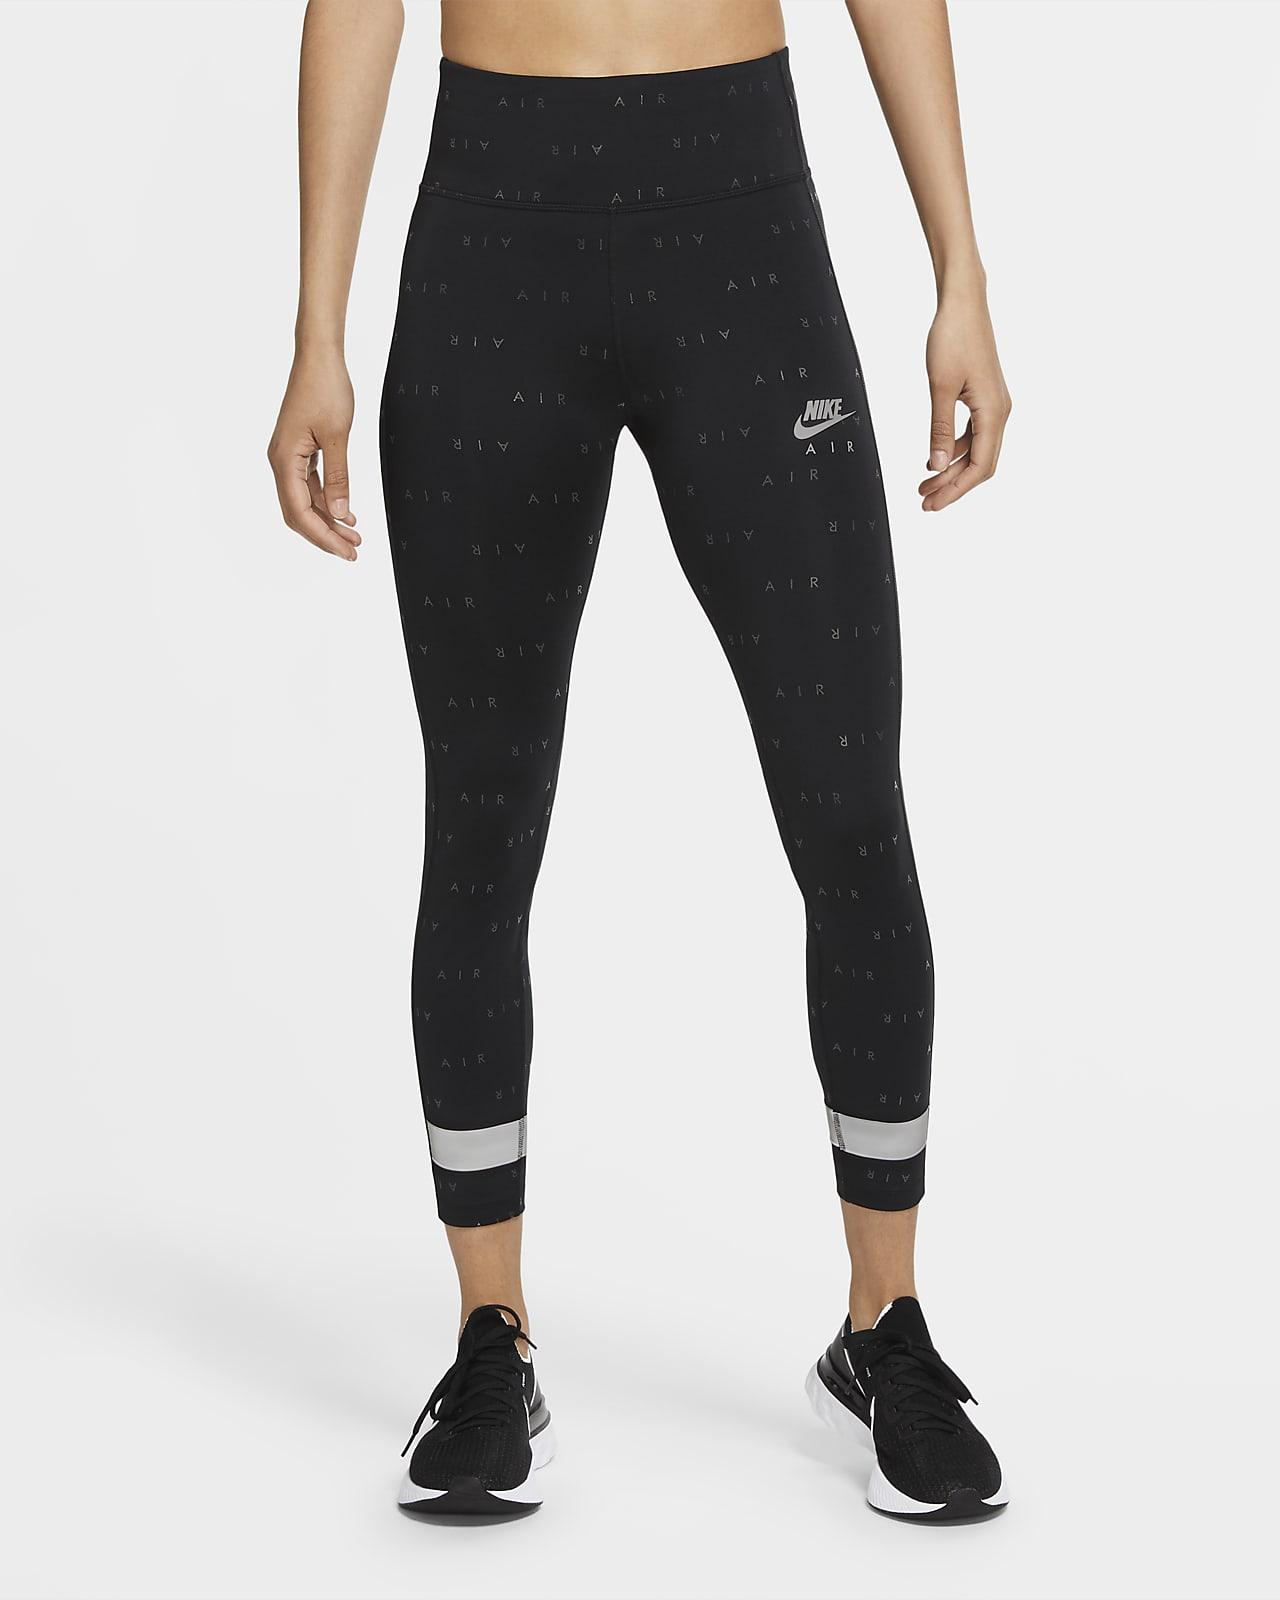 Nike Air Women's 7/8 Running Leggings